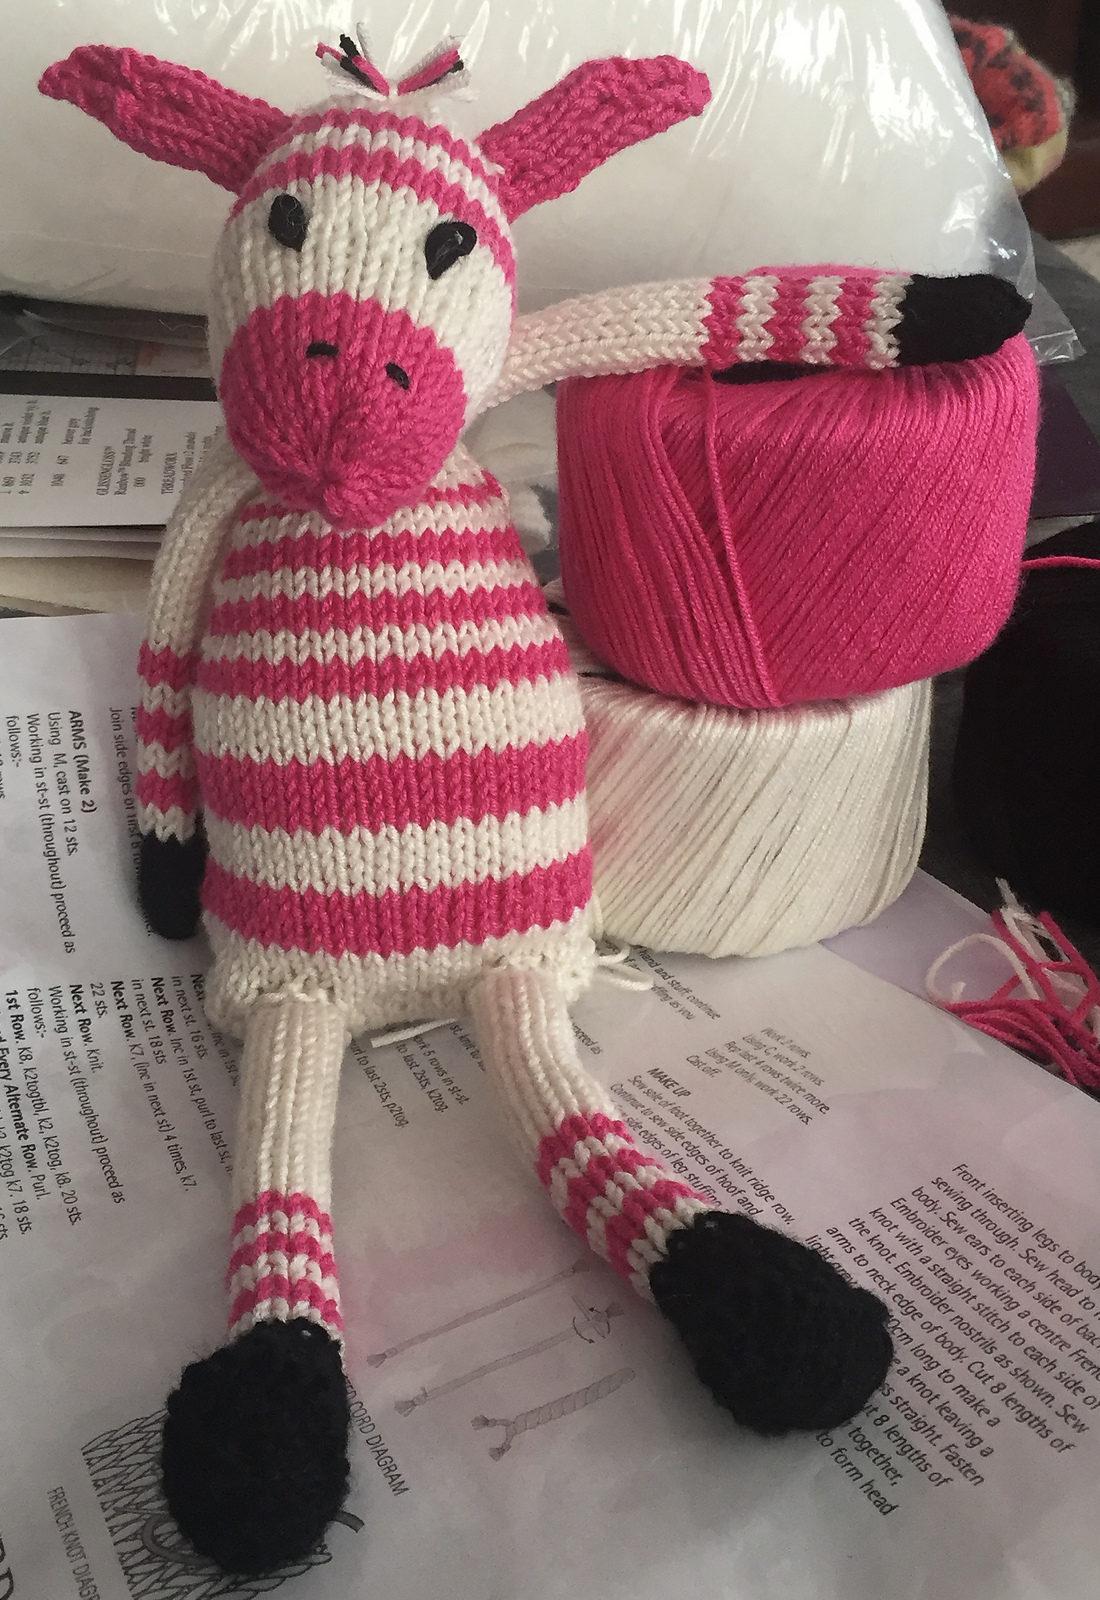 Free Knitting Pattern for Zany Zebras